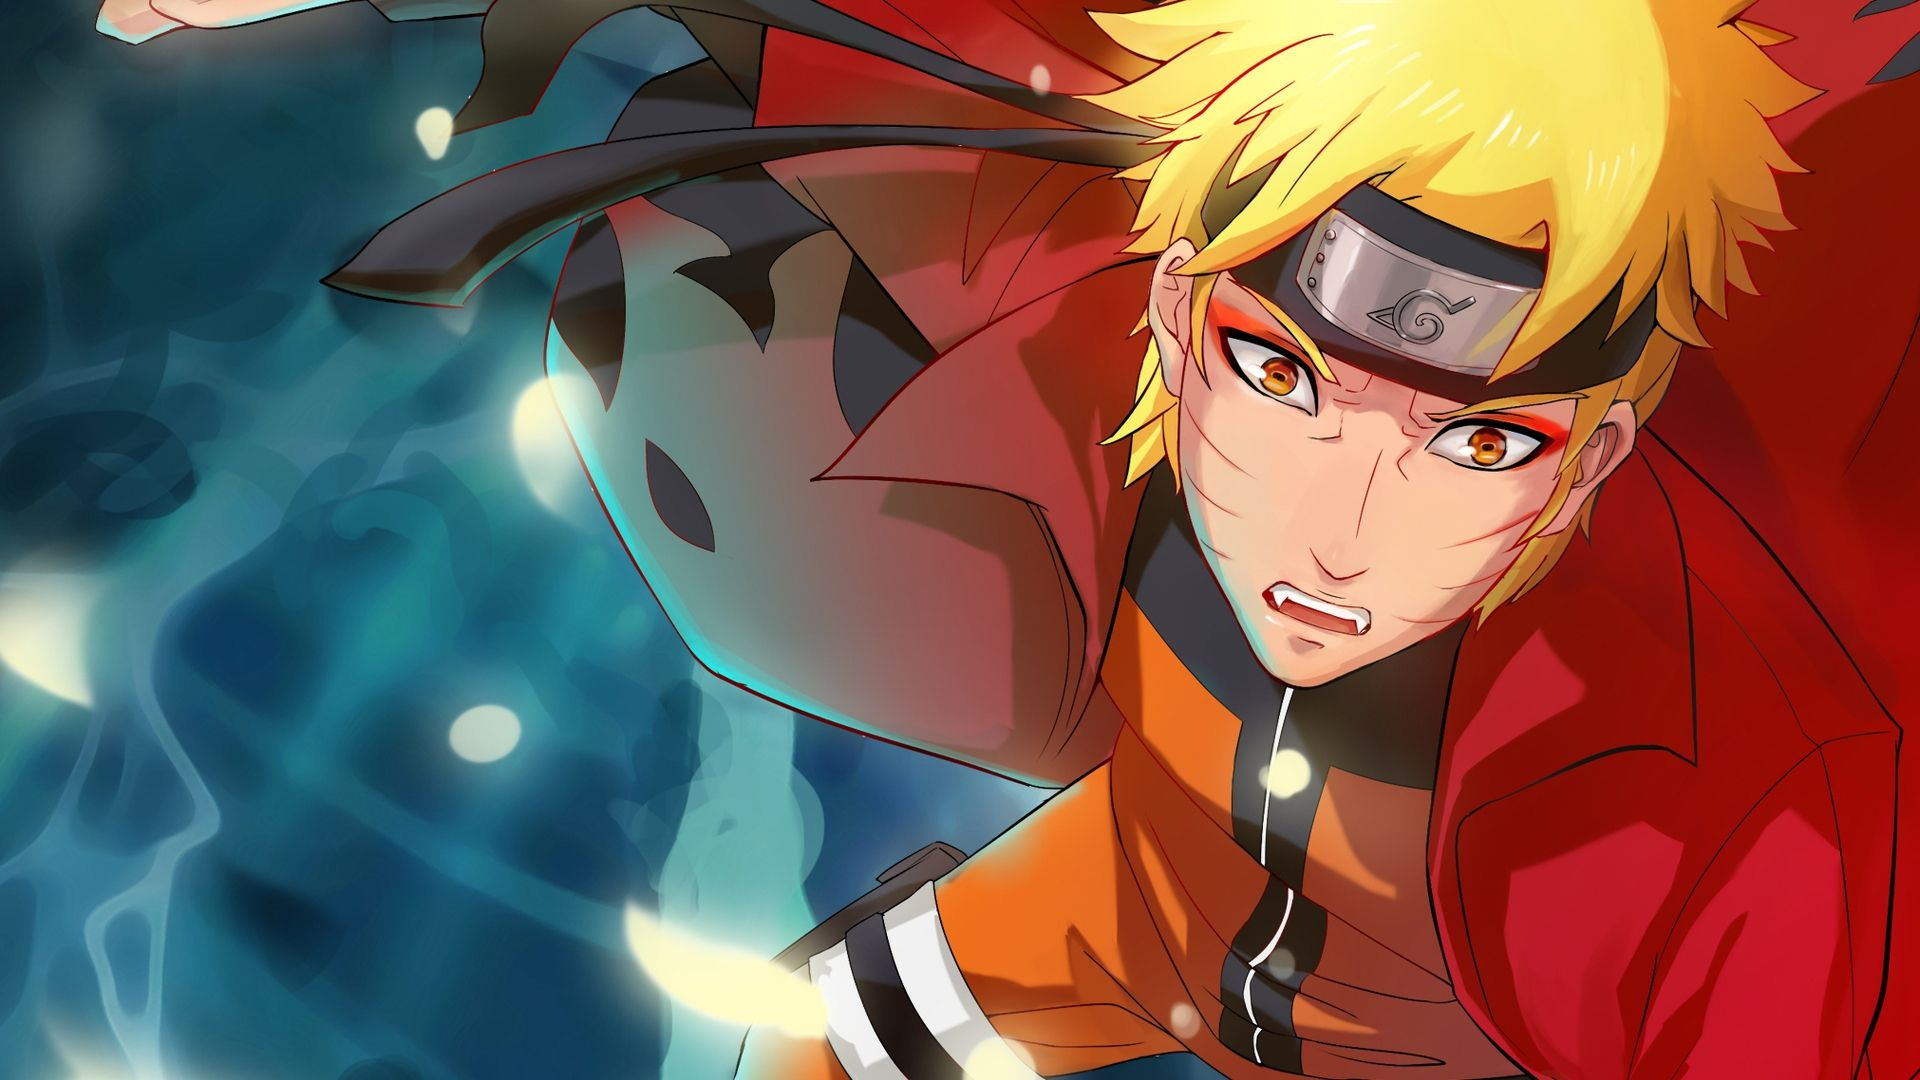 Imagenes De Naruto Wallpaper Hd Para Bajar Gratis 3 Hd Wallpapers